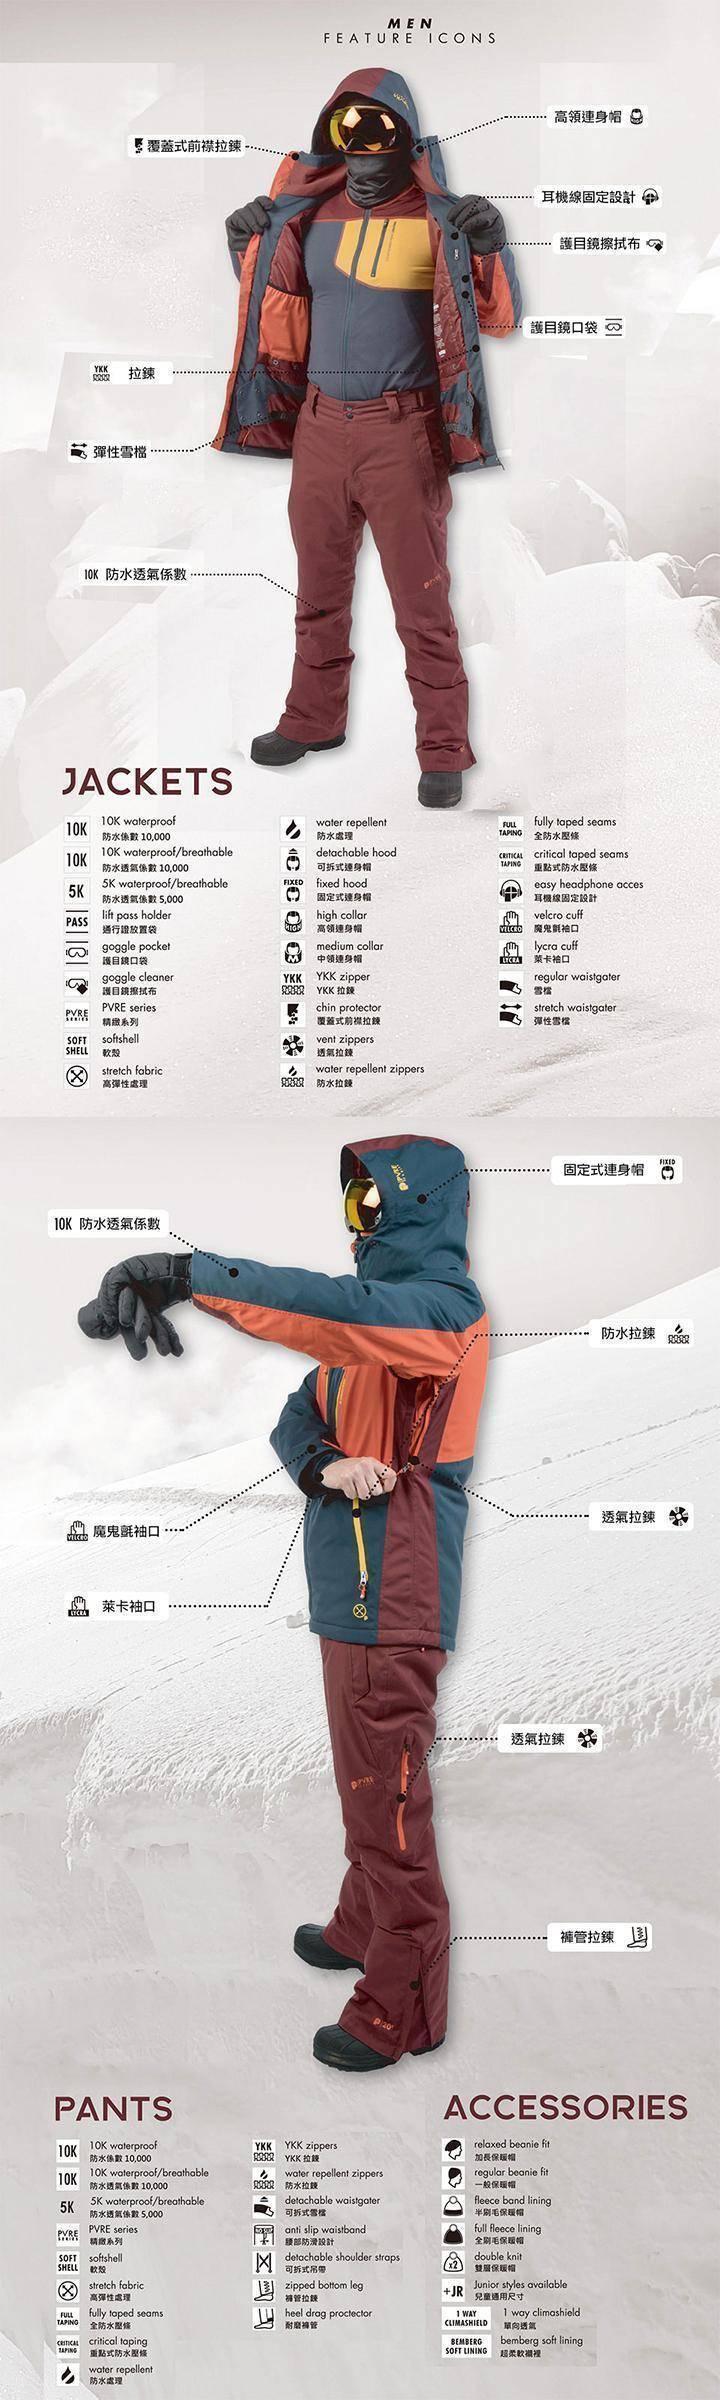 PROTEST 男 雪褲 (陽塵色) DENYSY 19 SNOWPANTS